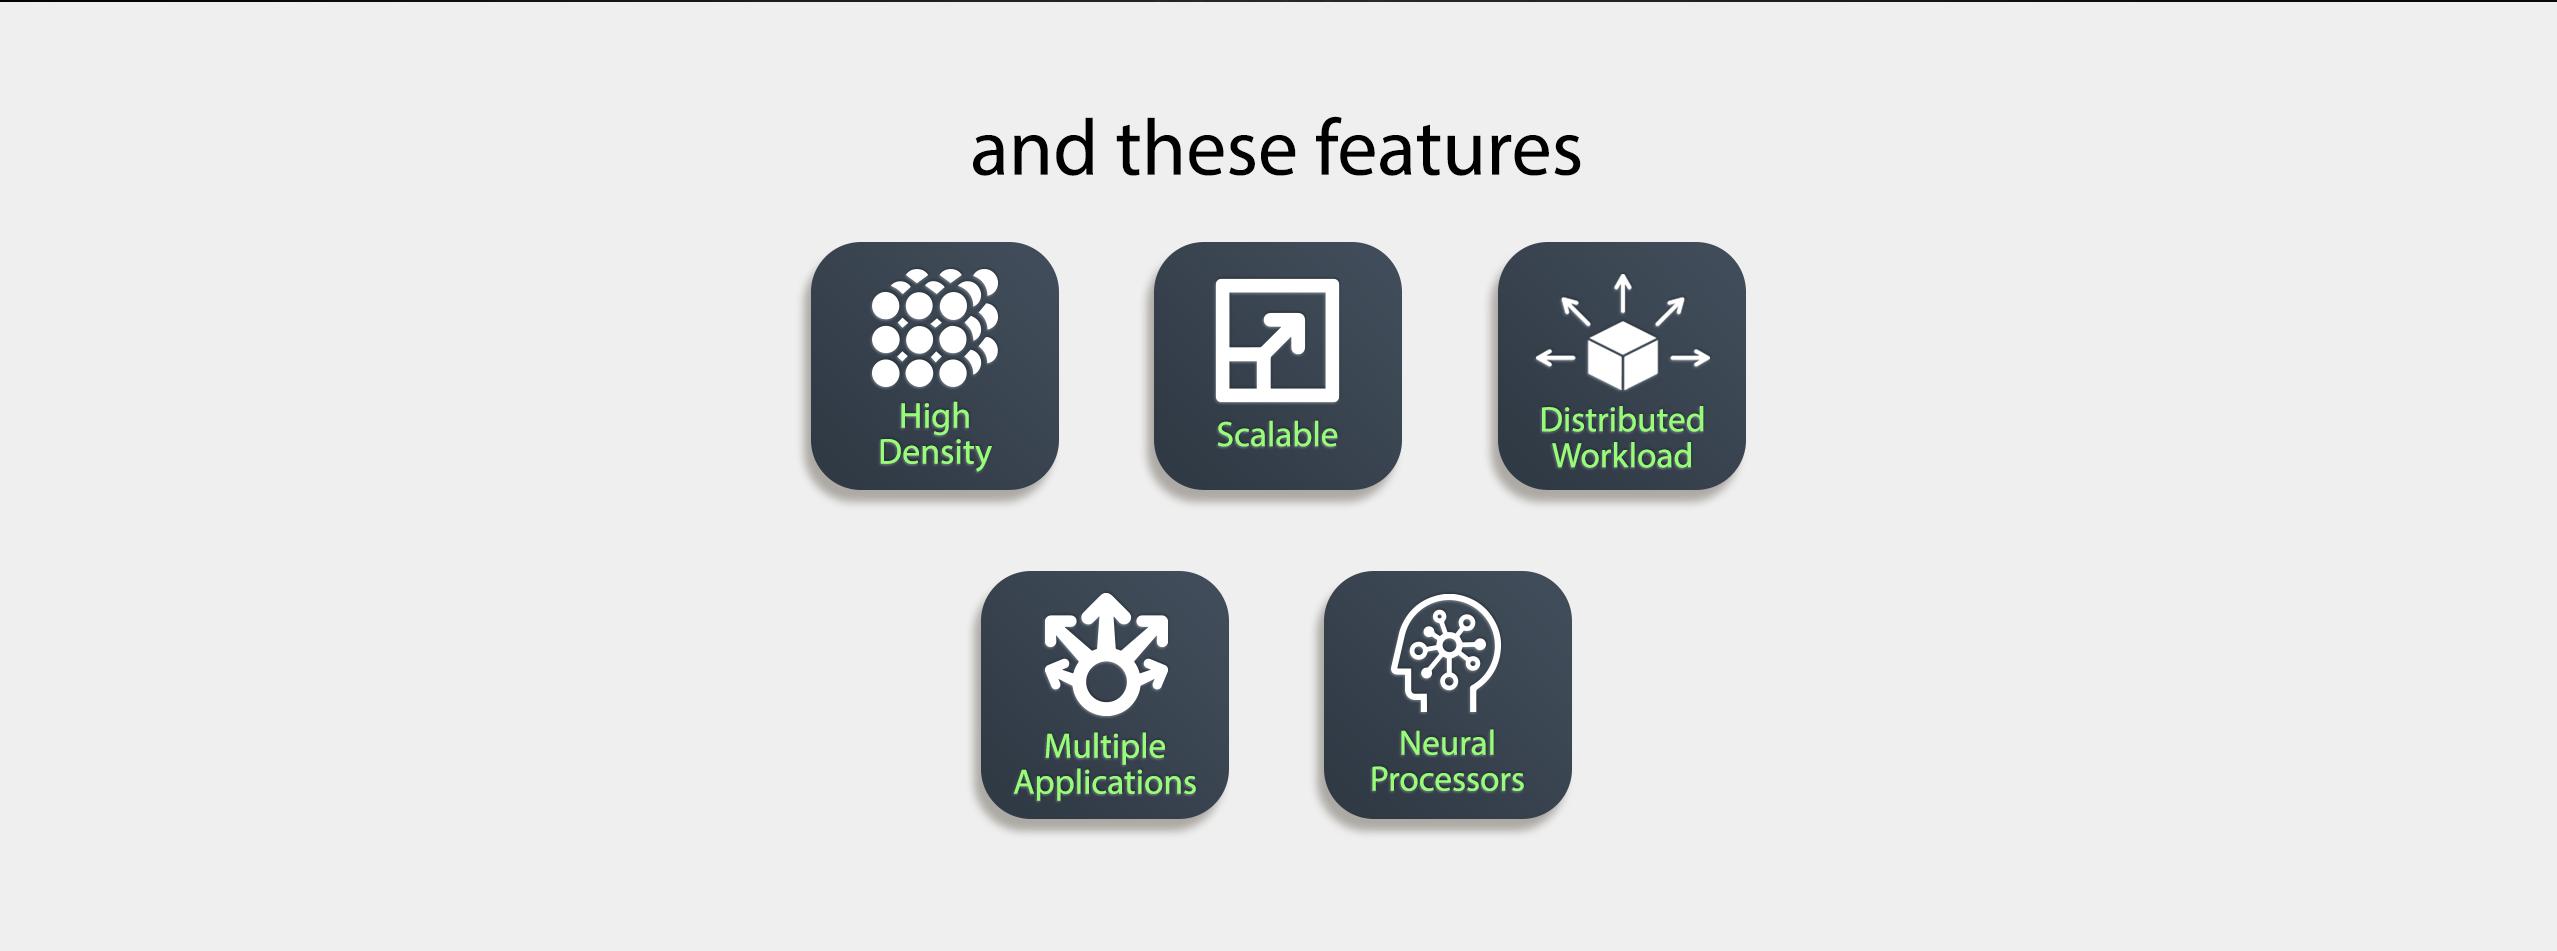 Cluster Server U1 features